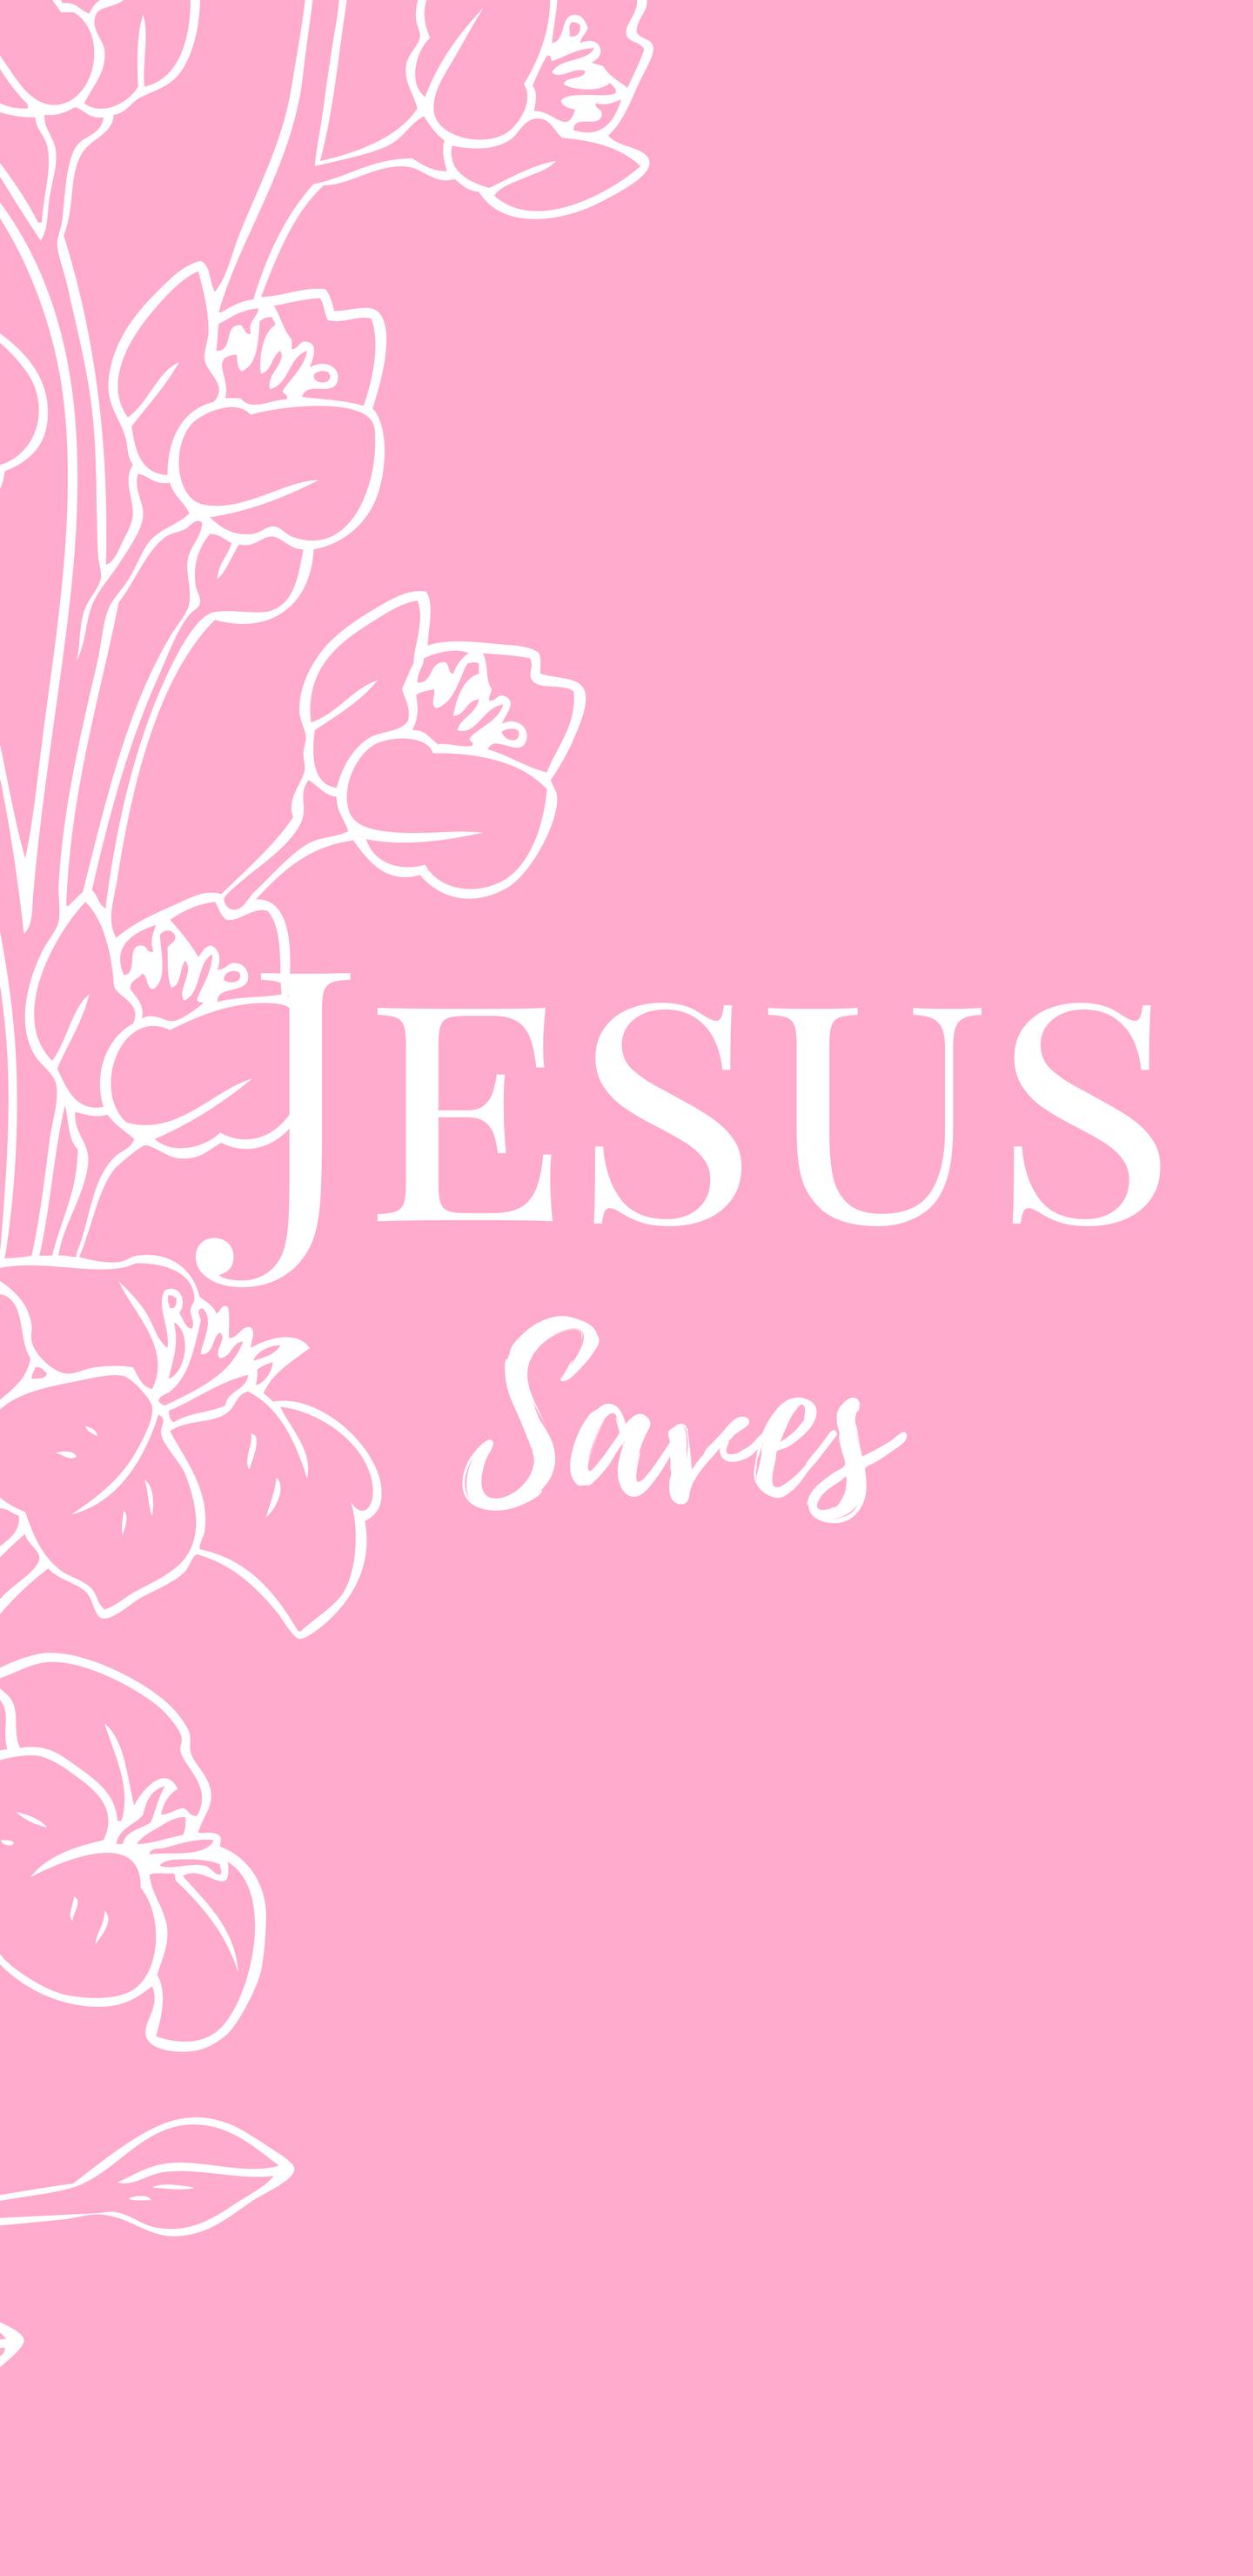 WallPapers Christian wallpaper, Free christian wallpaper